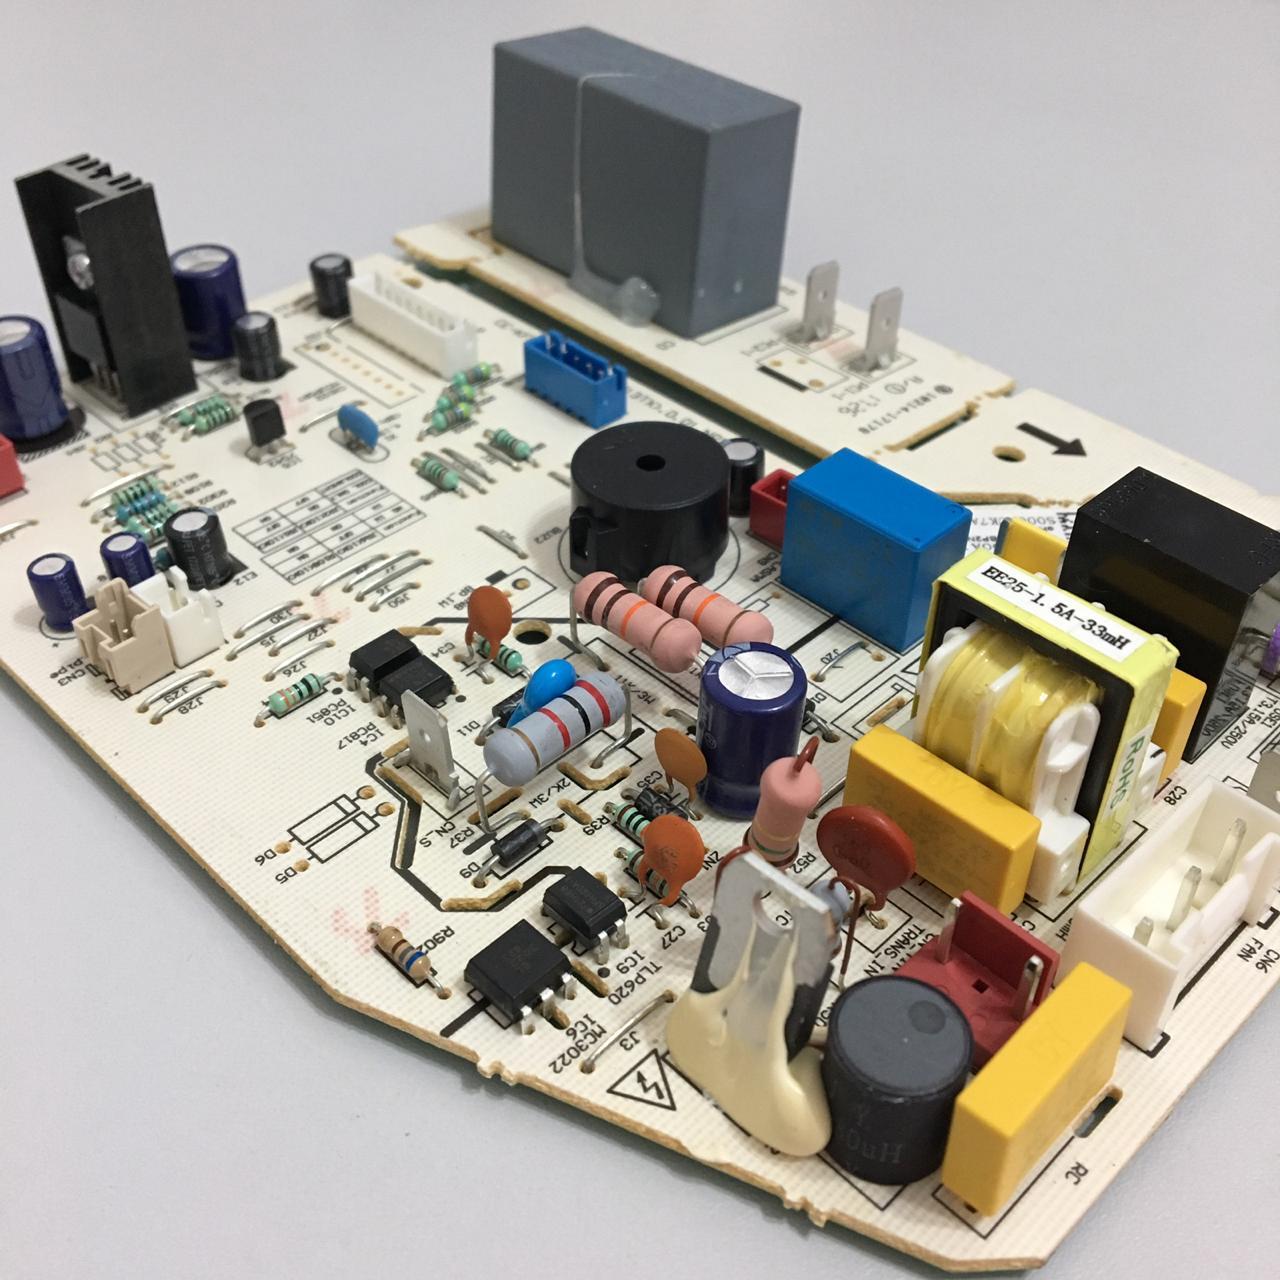 Placa Eletrônica Principal Ar Condicionado Hi-wall Springer Carrier Midea